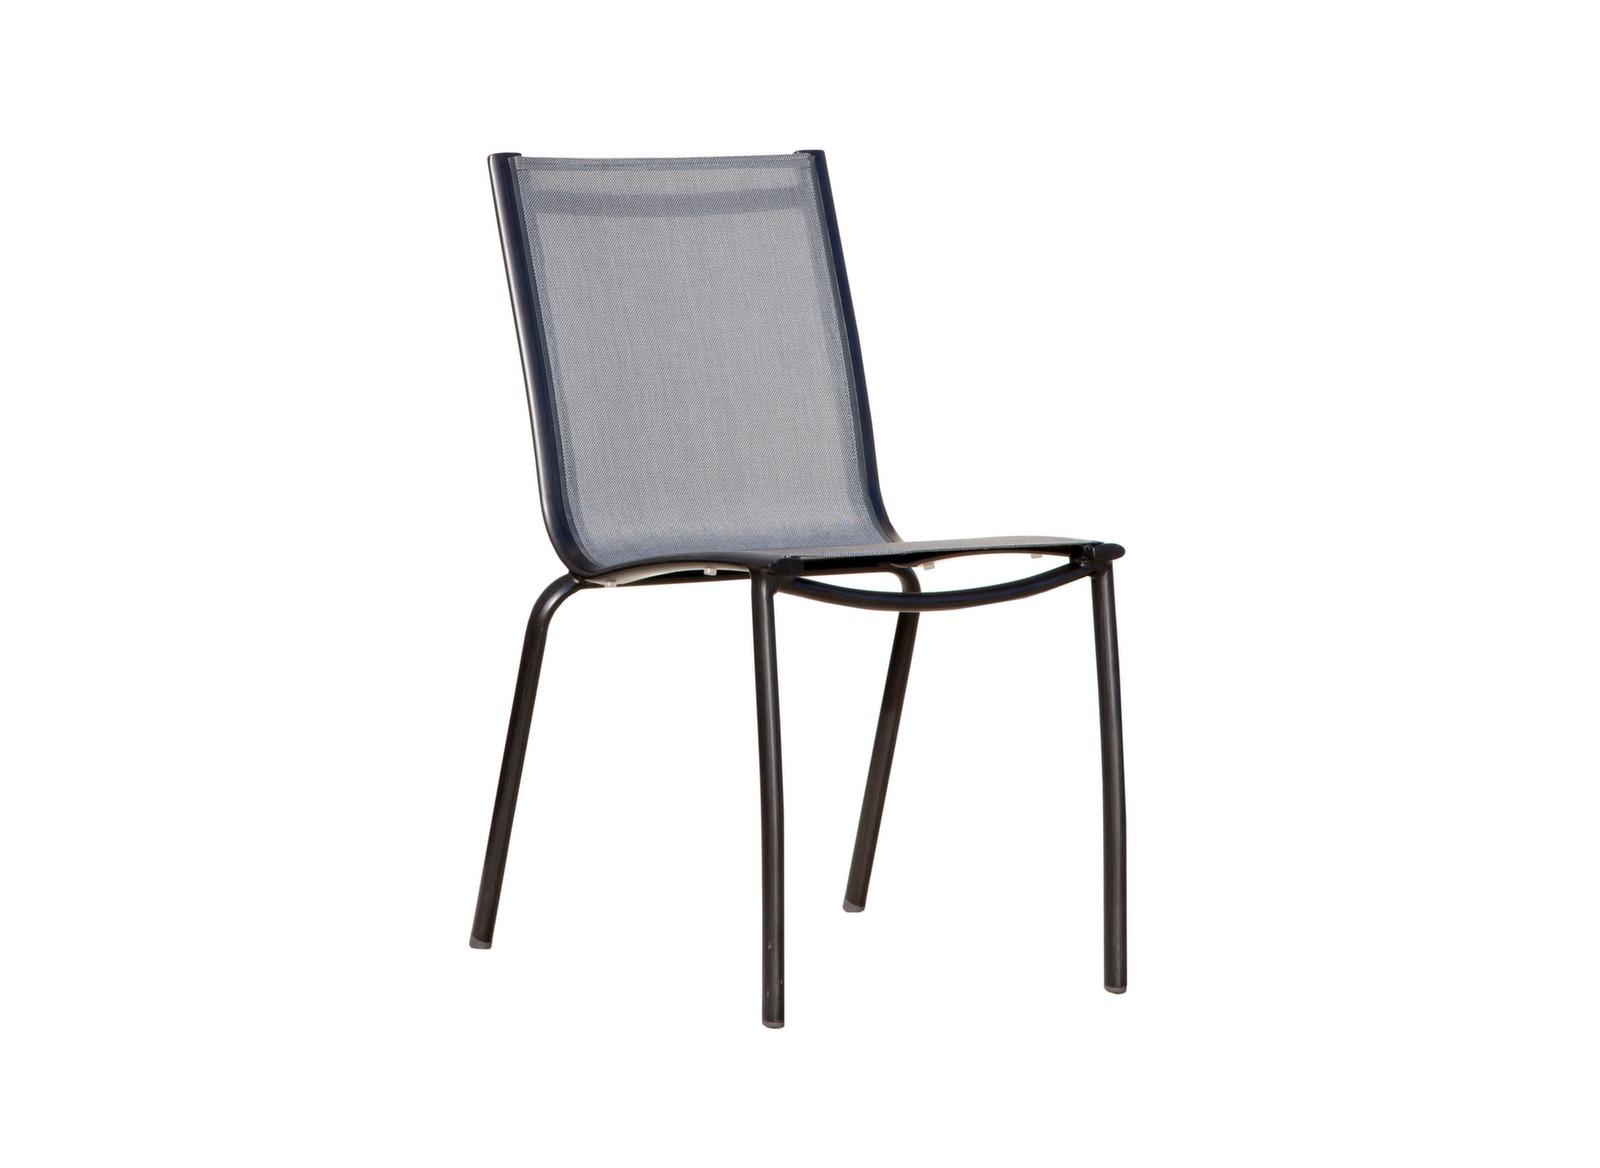 Chaise empilable Linéa (finition brush)